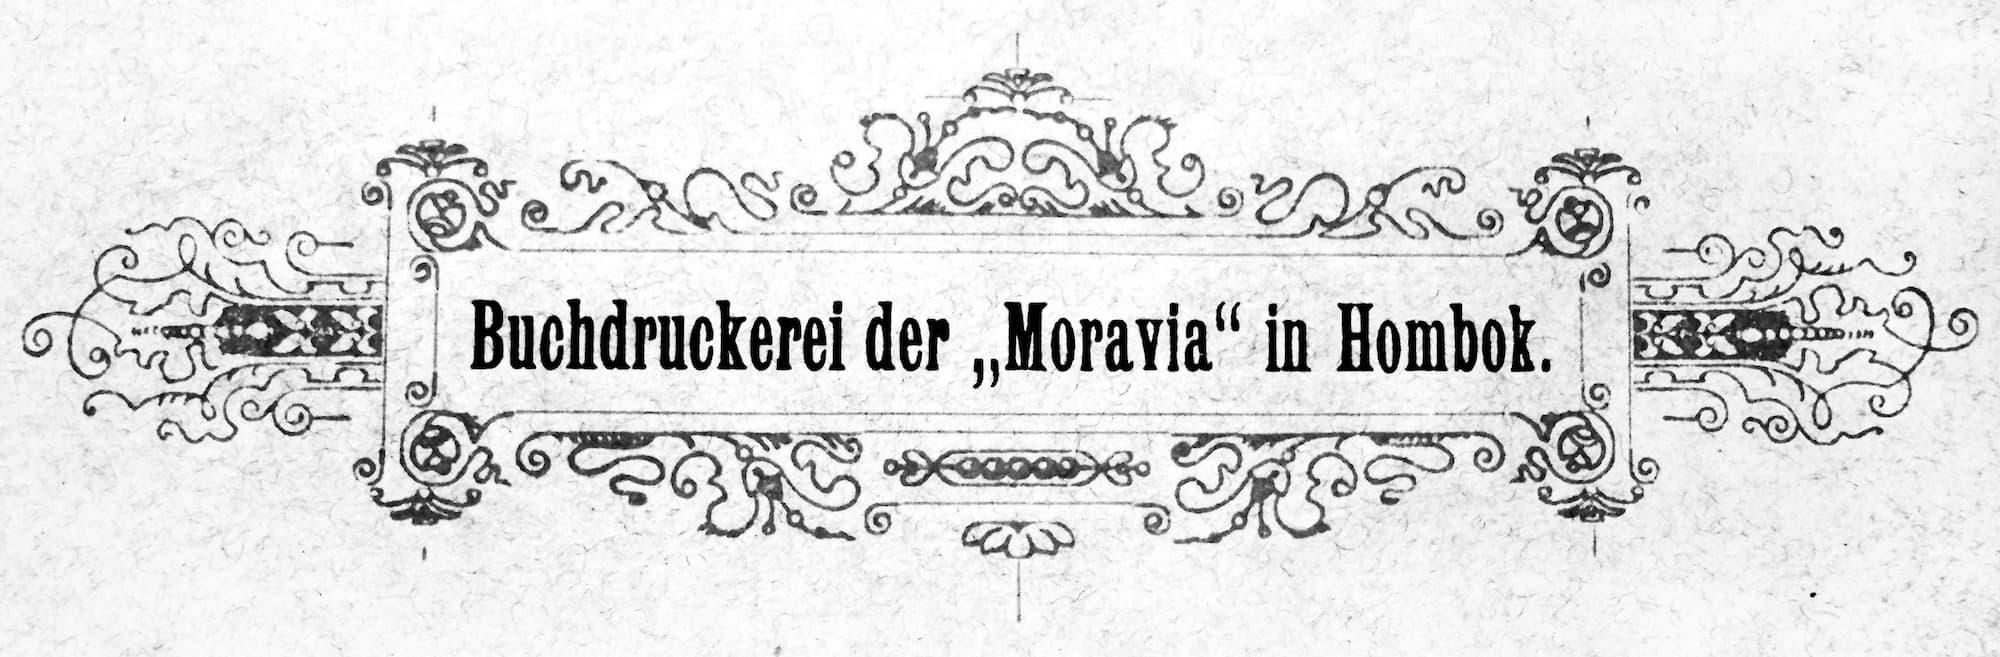 Knihtisk v Moravii v Hlubočkách